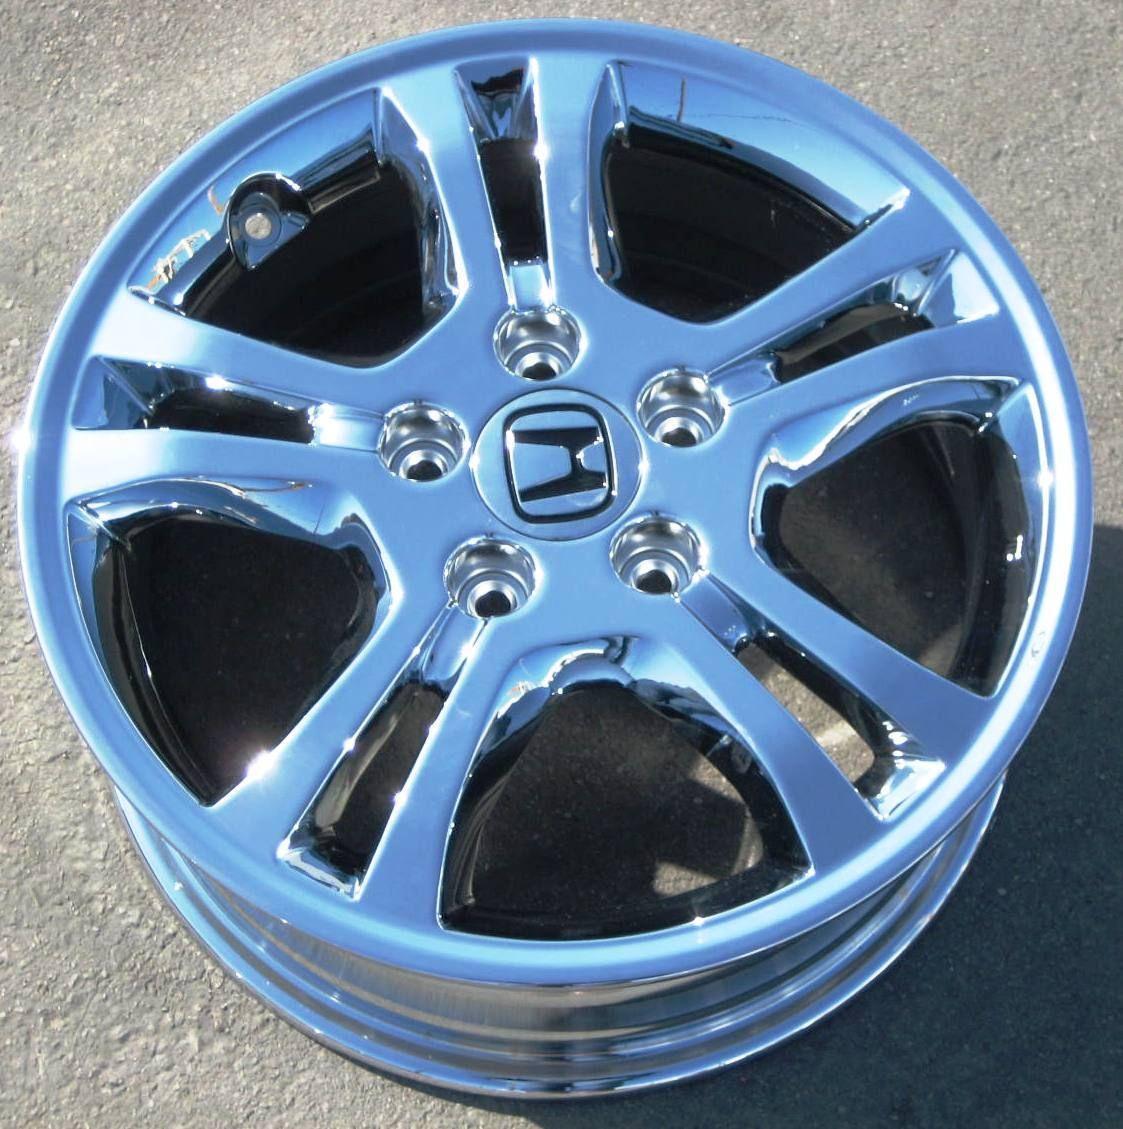 16 Factory Honda Accord Chrome Alloy Wheel Rim 63907 16x6 5 1 Single